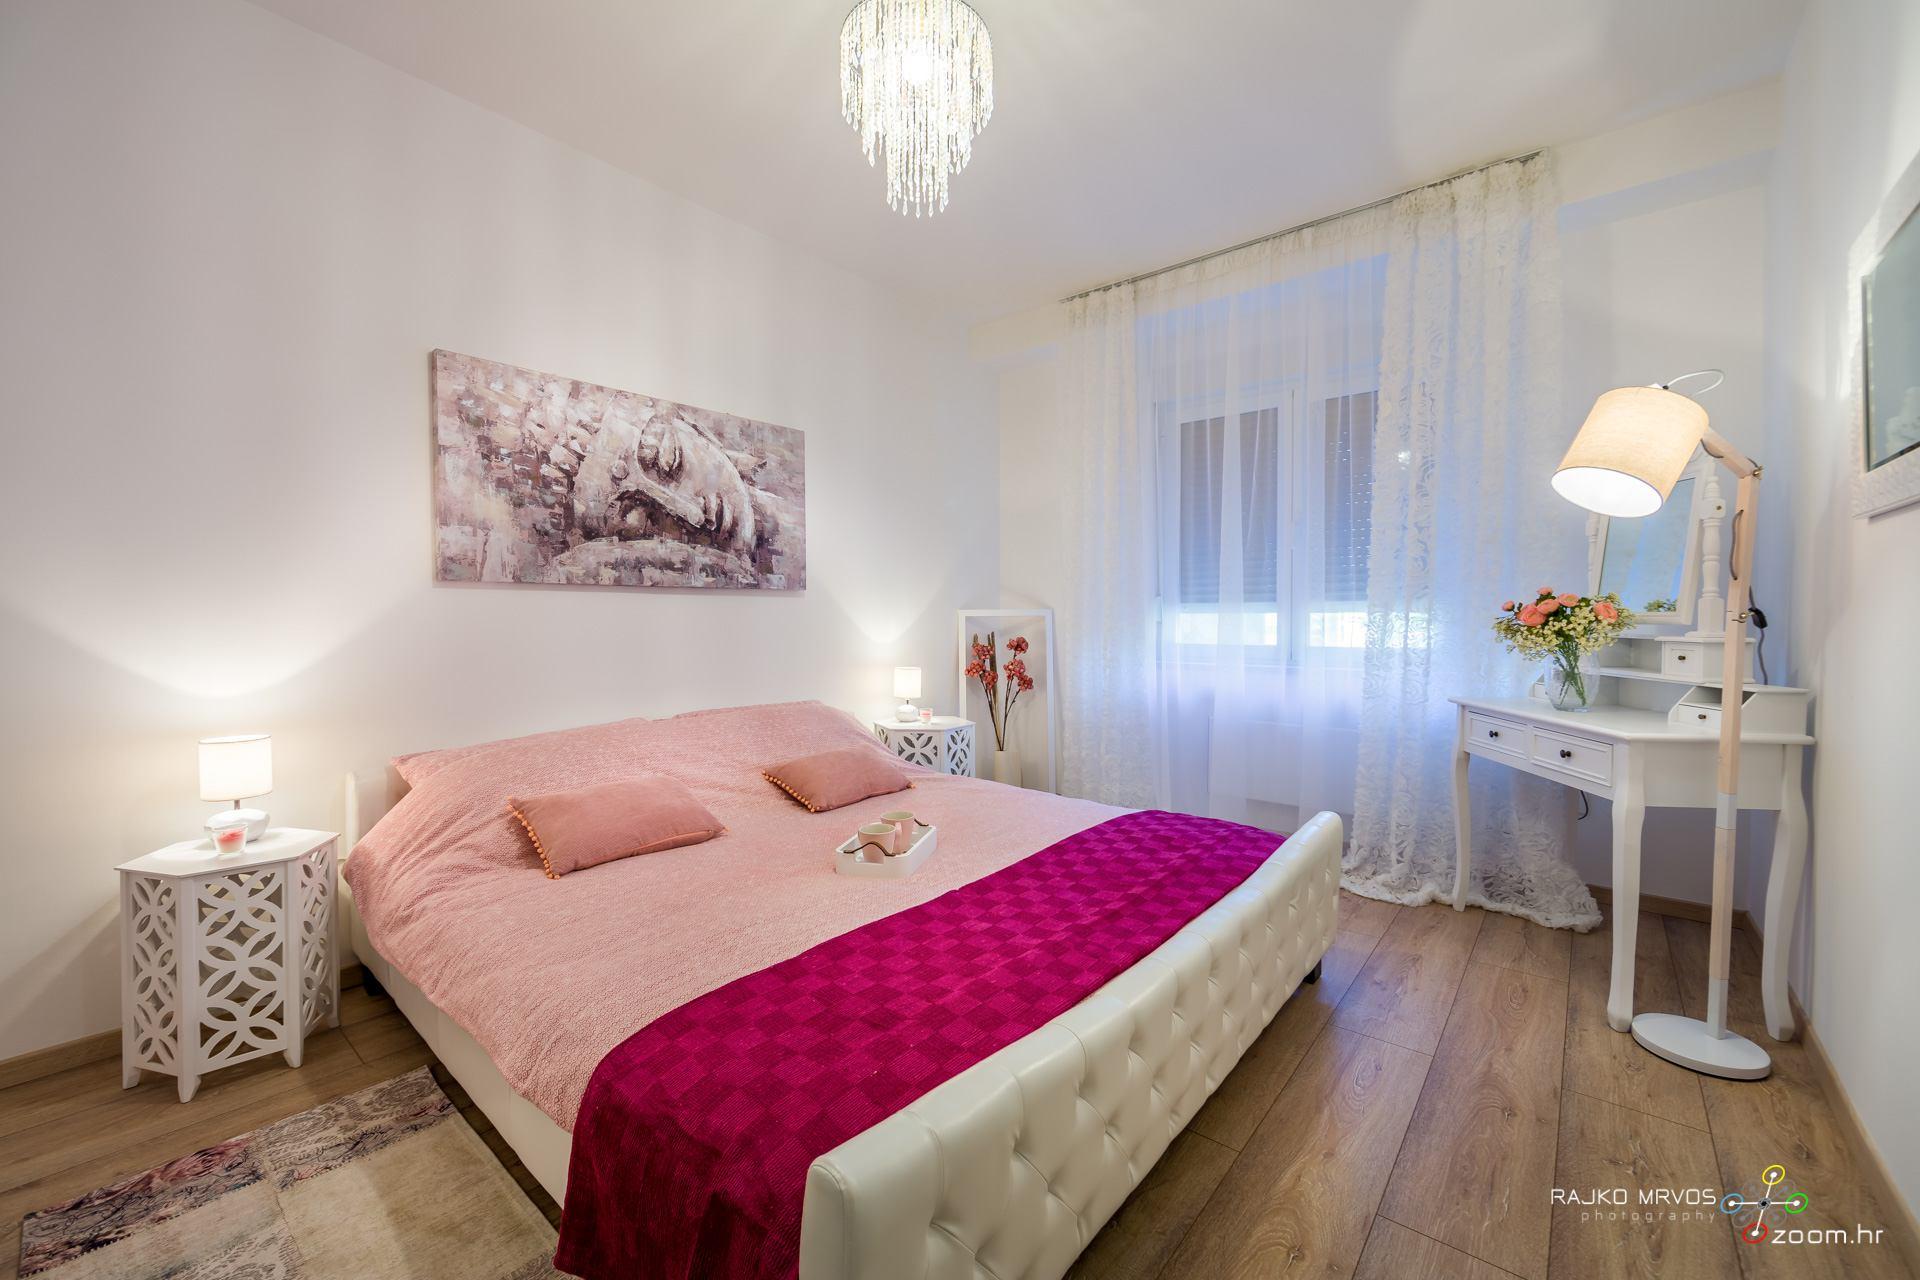 fotografiranje-interijera-fotograf-apartmana-vila-kuca-hotela-apartman-Gabby-Rijeka-6